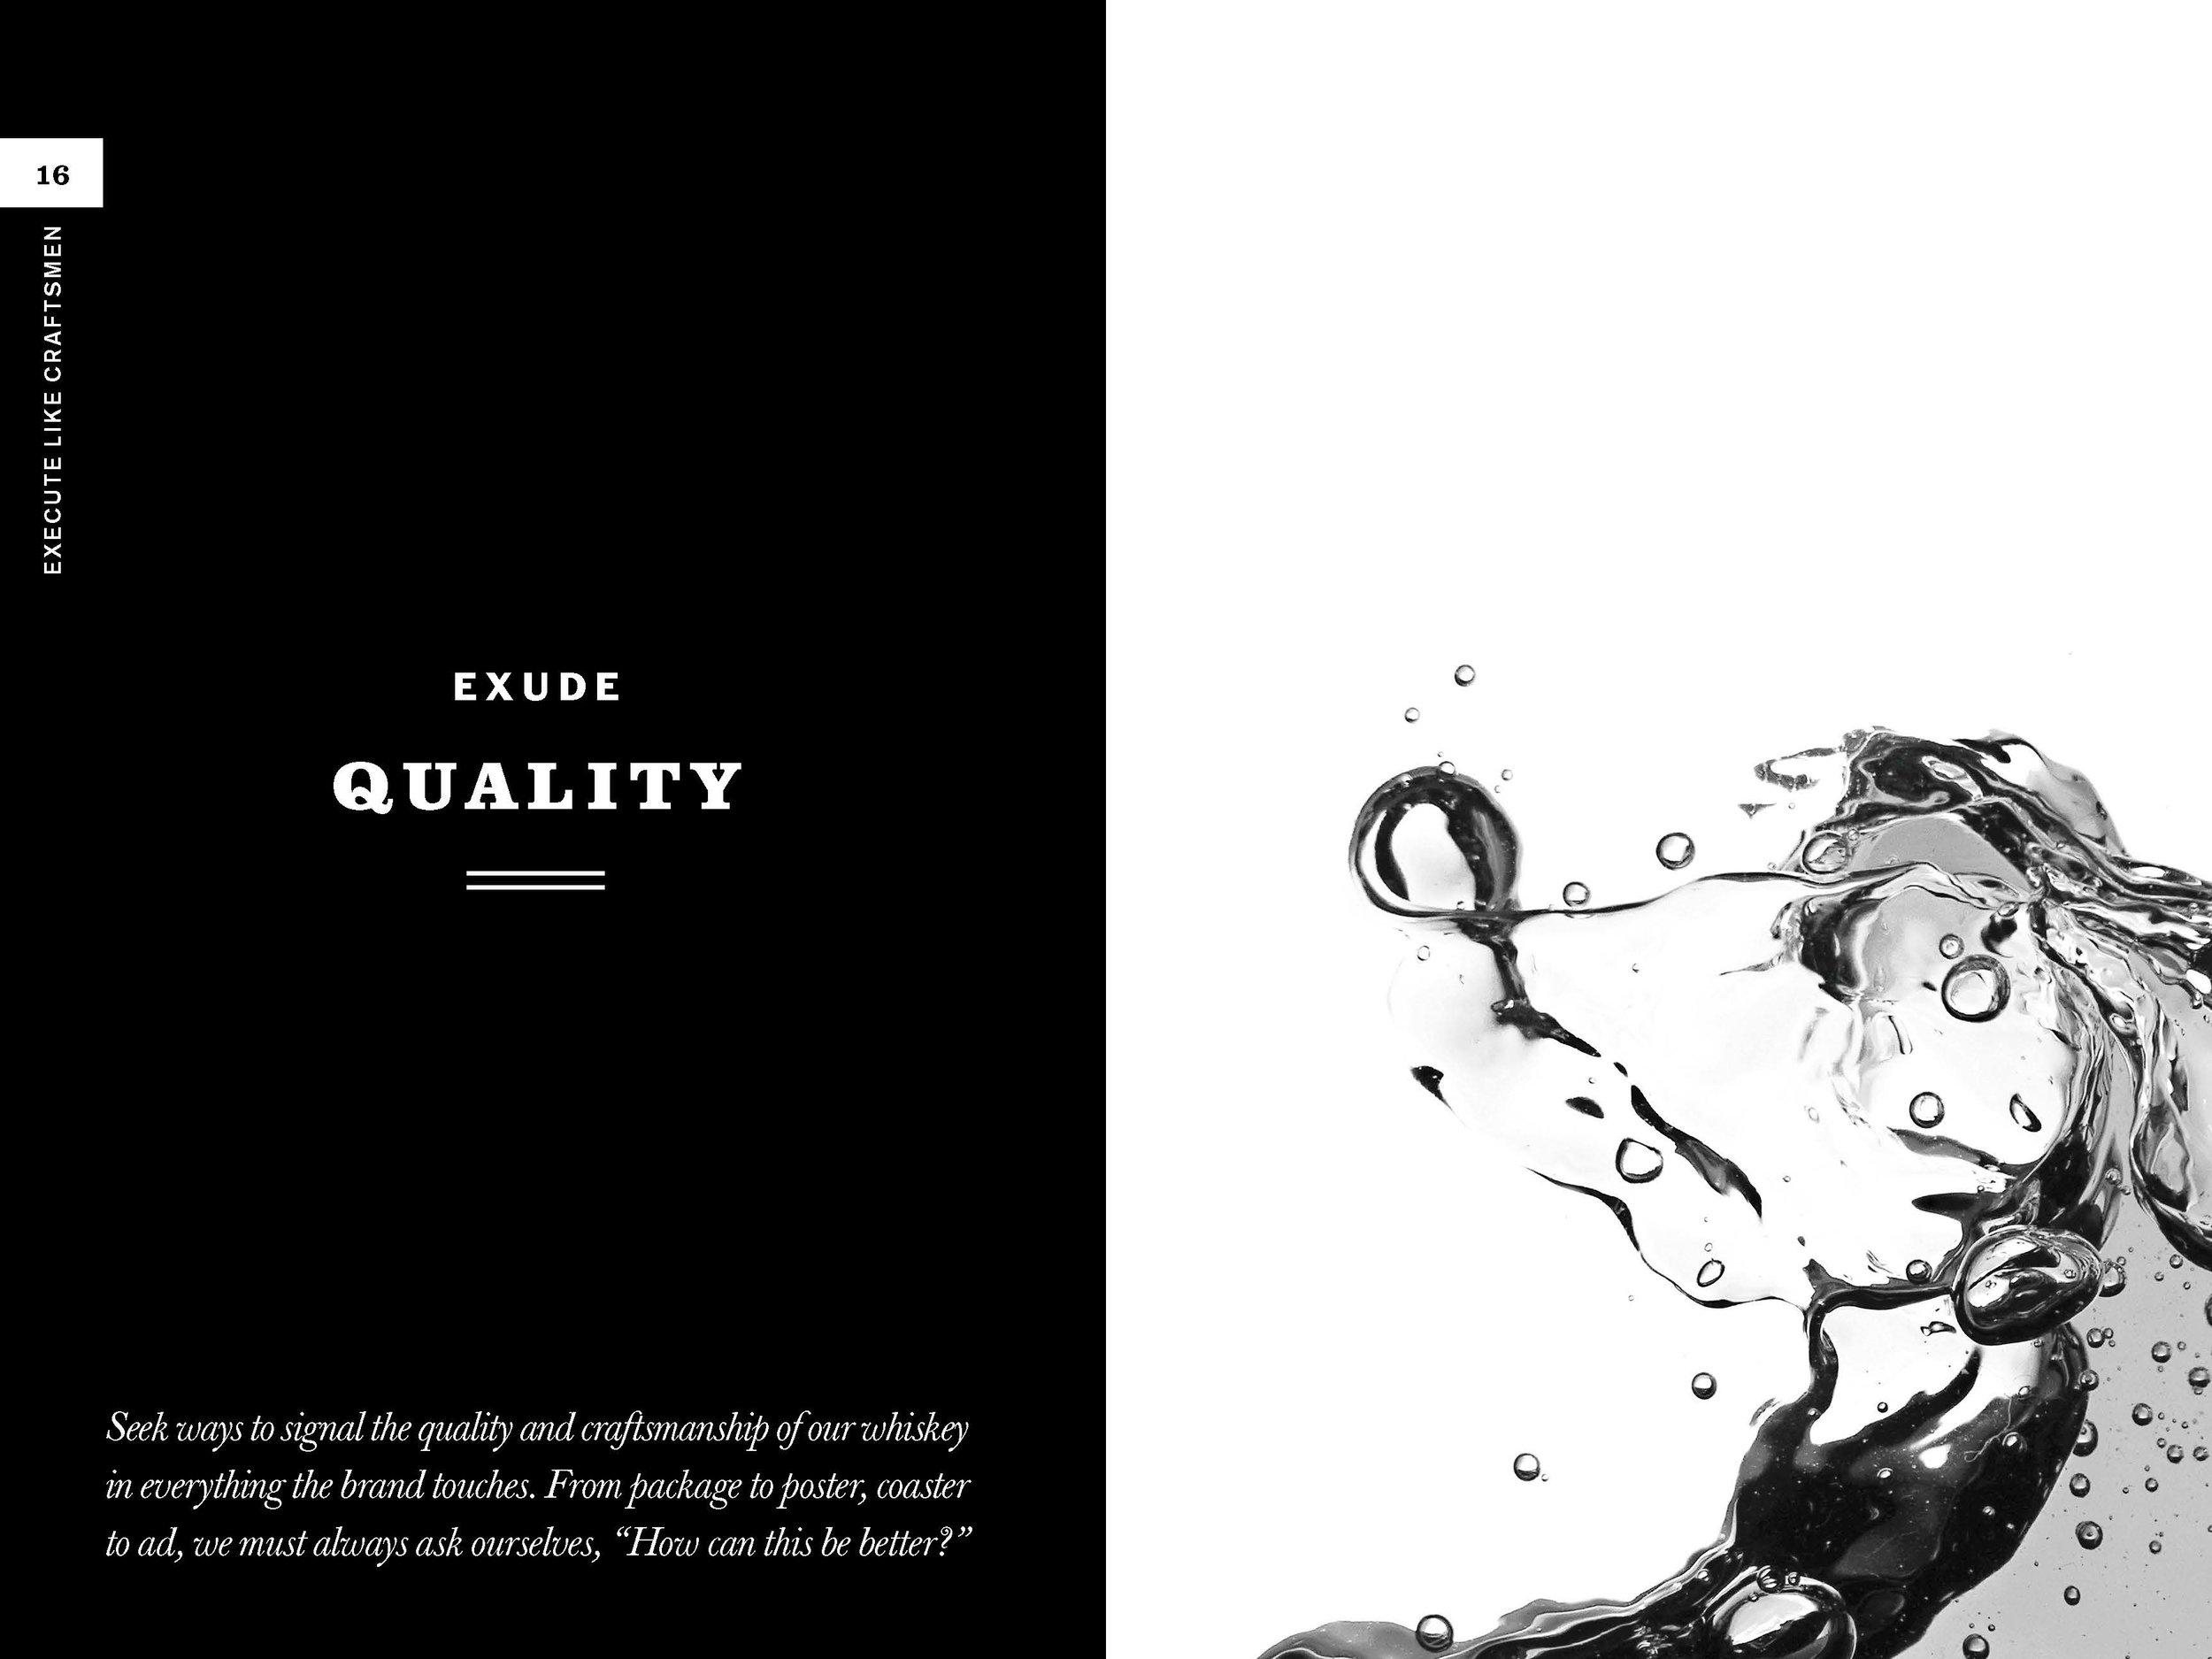 Jack Daniel's Guiding Principles 2012_Page_12.jpg